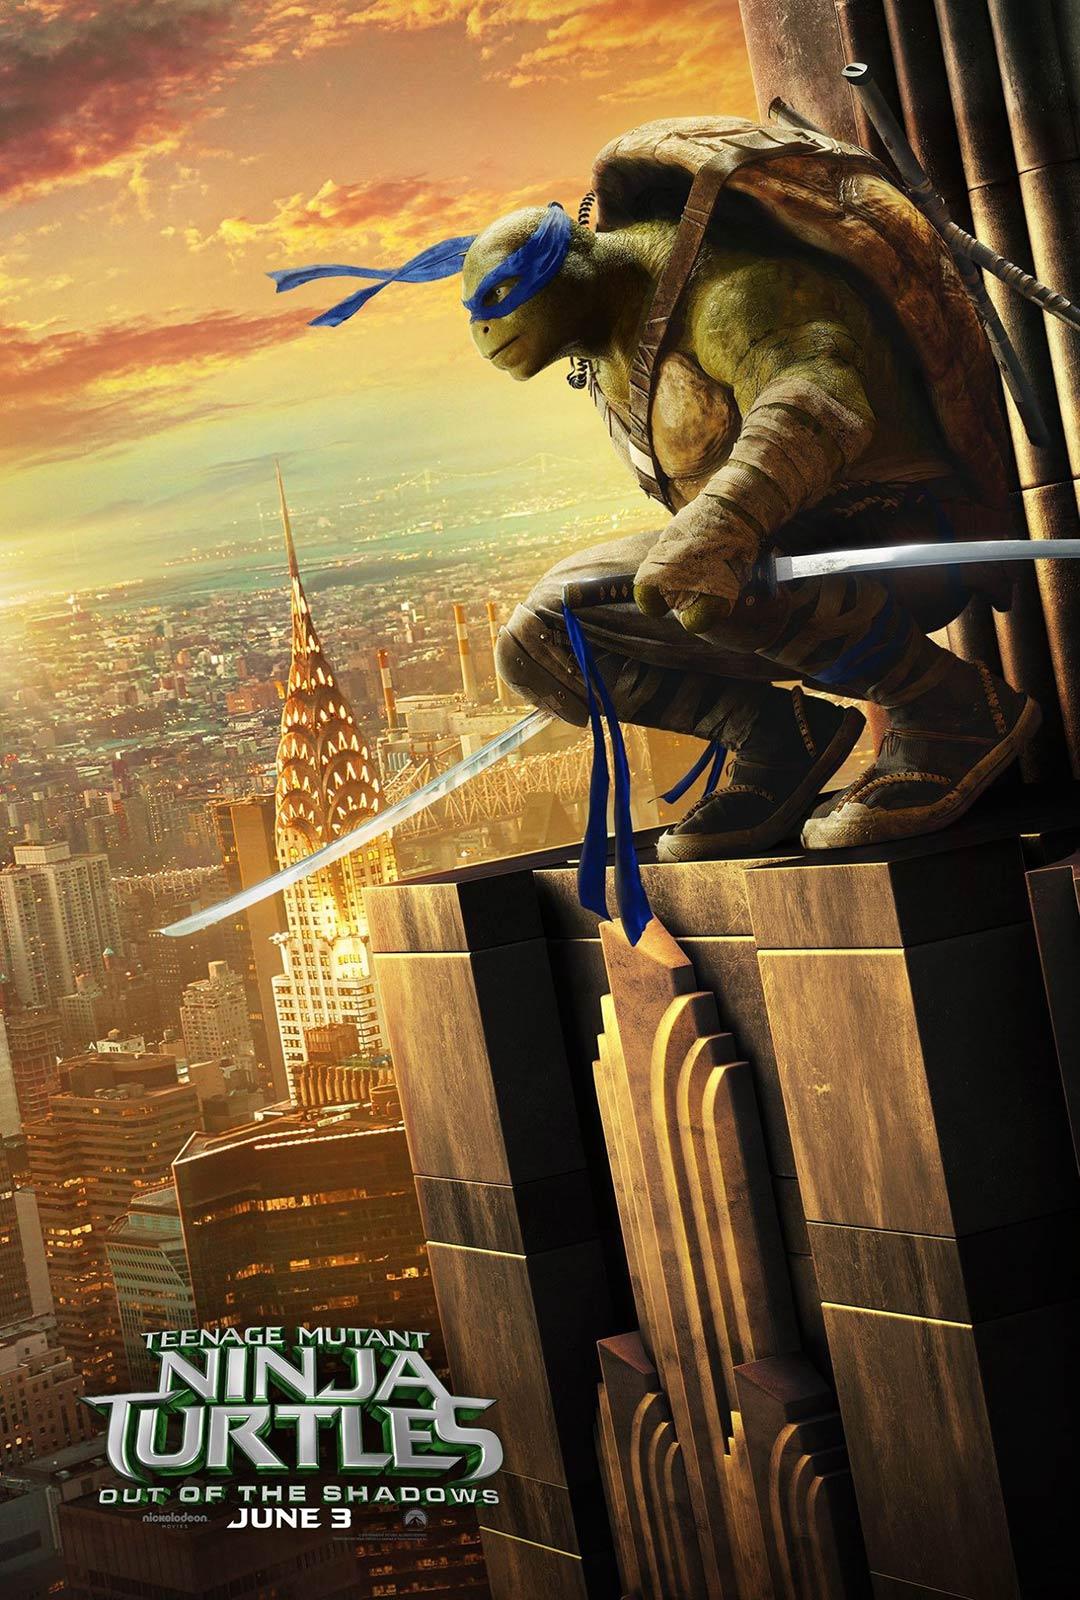 [Teenage Mutant Ninja Turtles: Out of the Shadows poster]